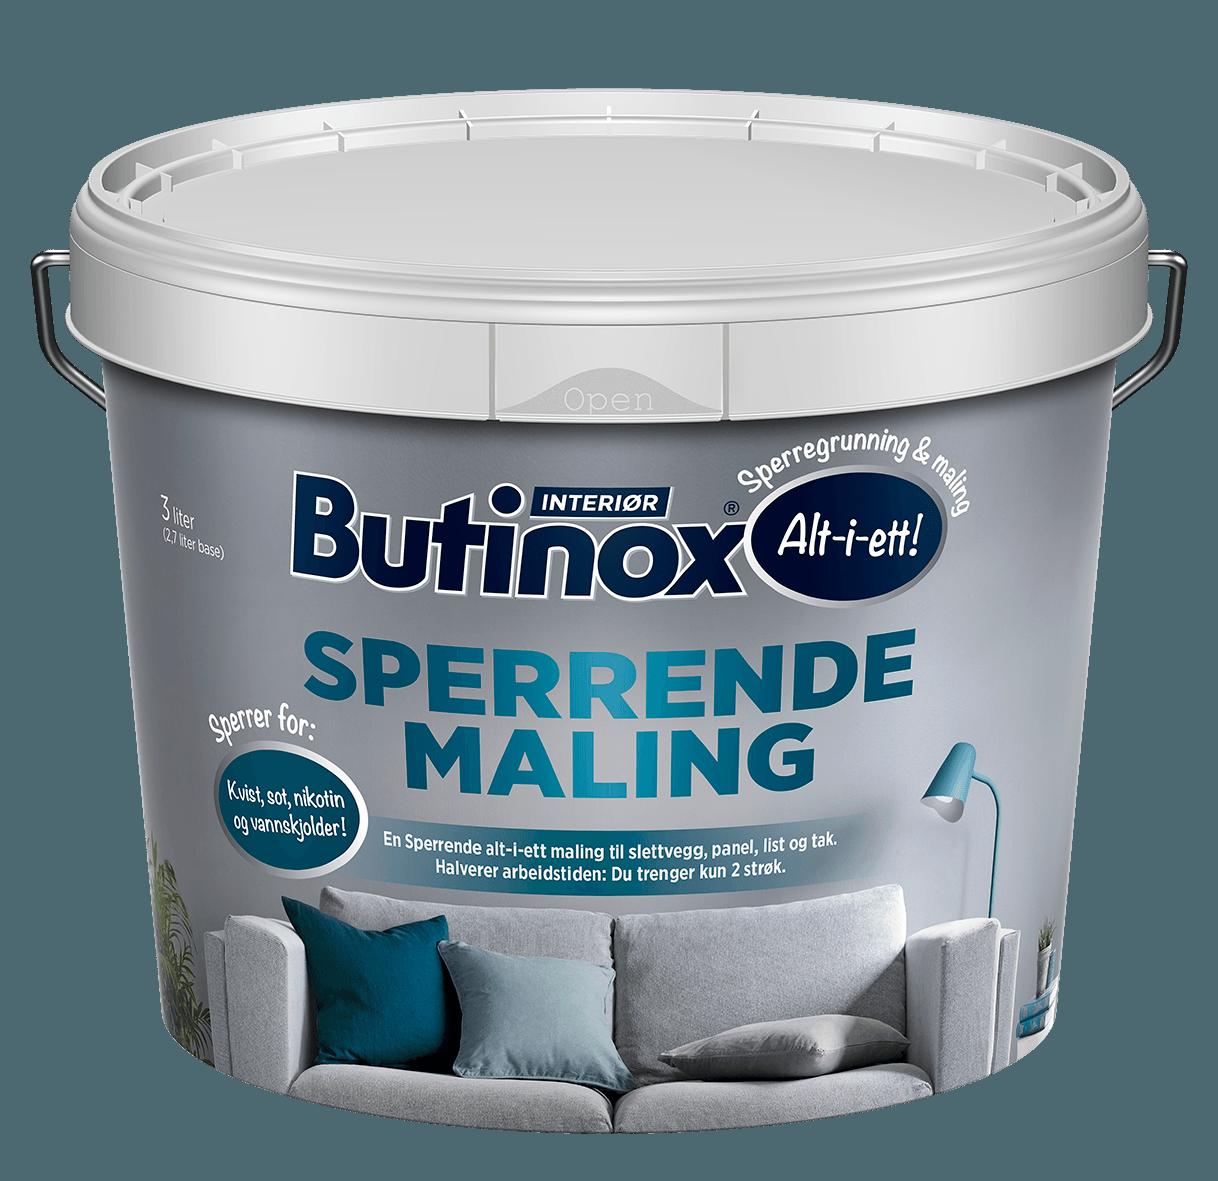 3L_Butinox_Interioer_Sperrende-Maling_Lavopploest